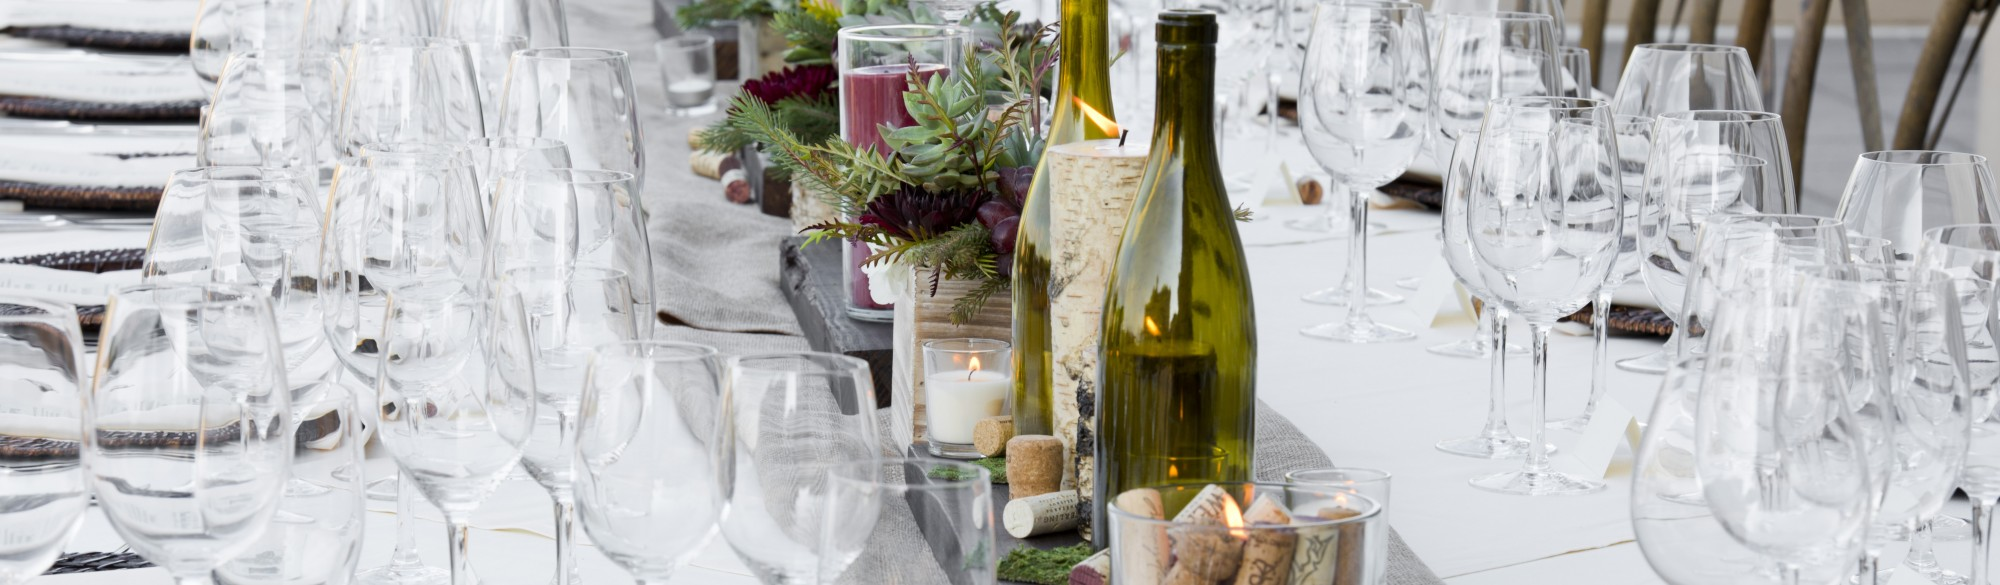 Wine Dinner at The Ballantyne Charlotte